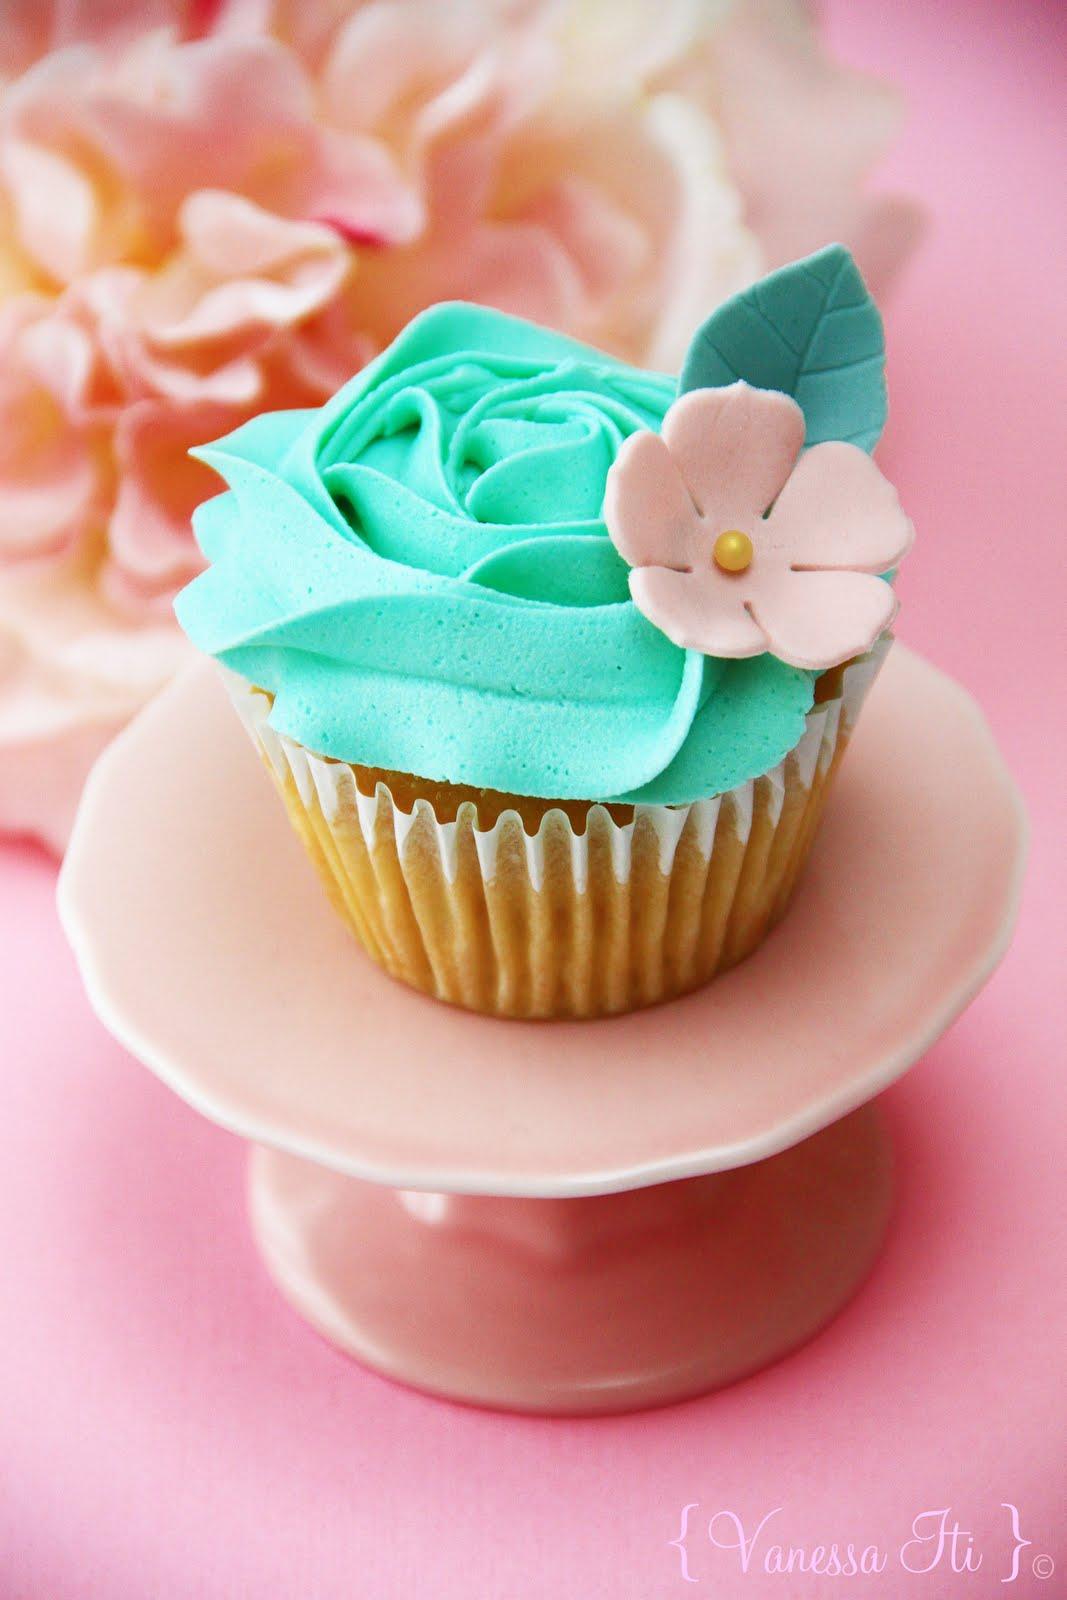 cupcakes - photo #48